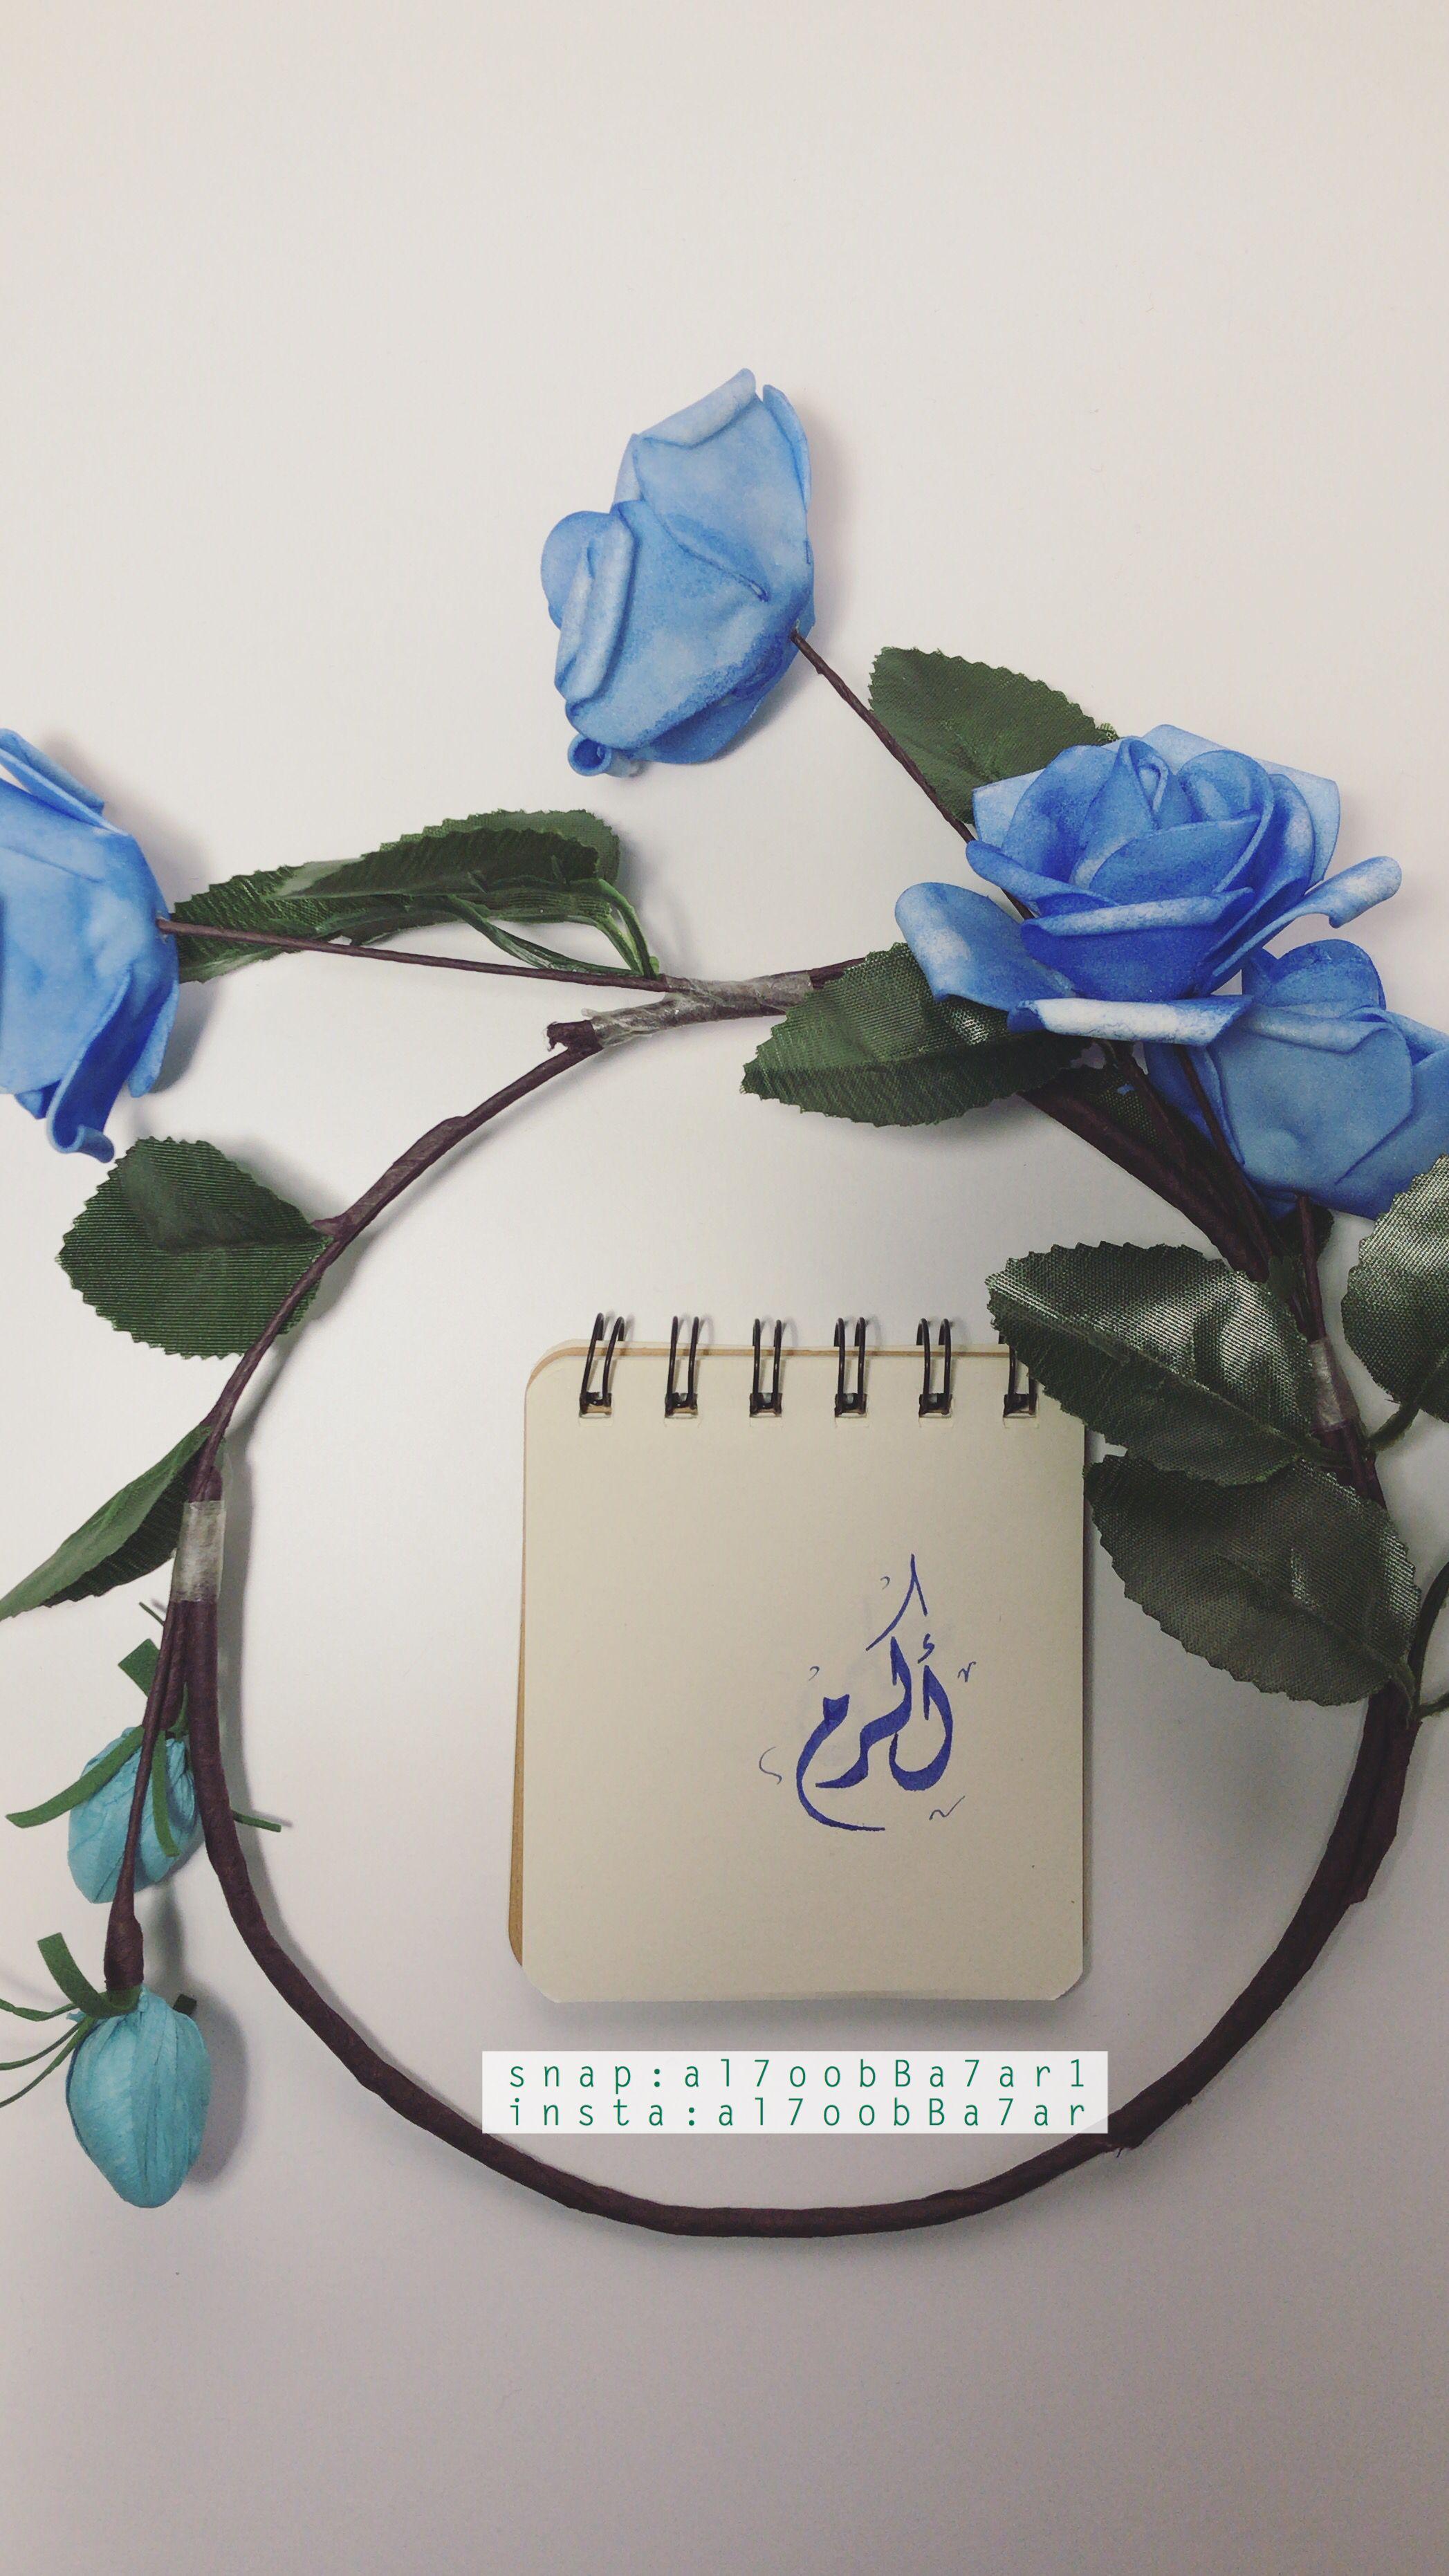 Pin By Afaf On أس م اء بالخ ط العربي Beautiful Hanukkah Wreath Decor